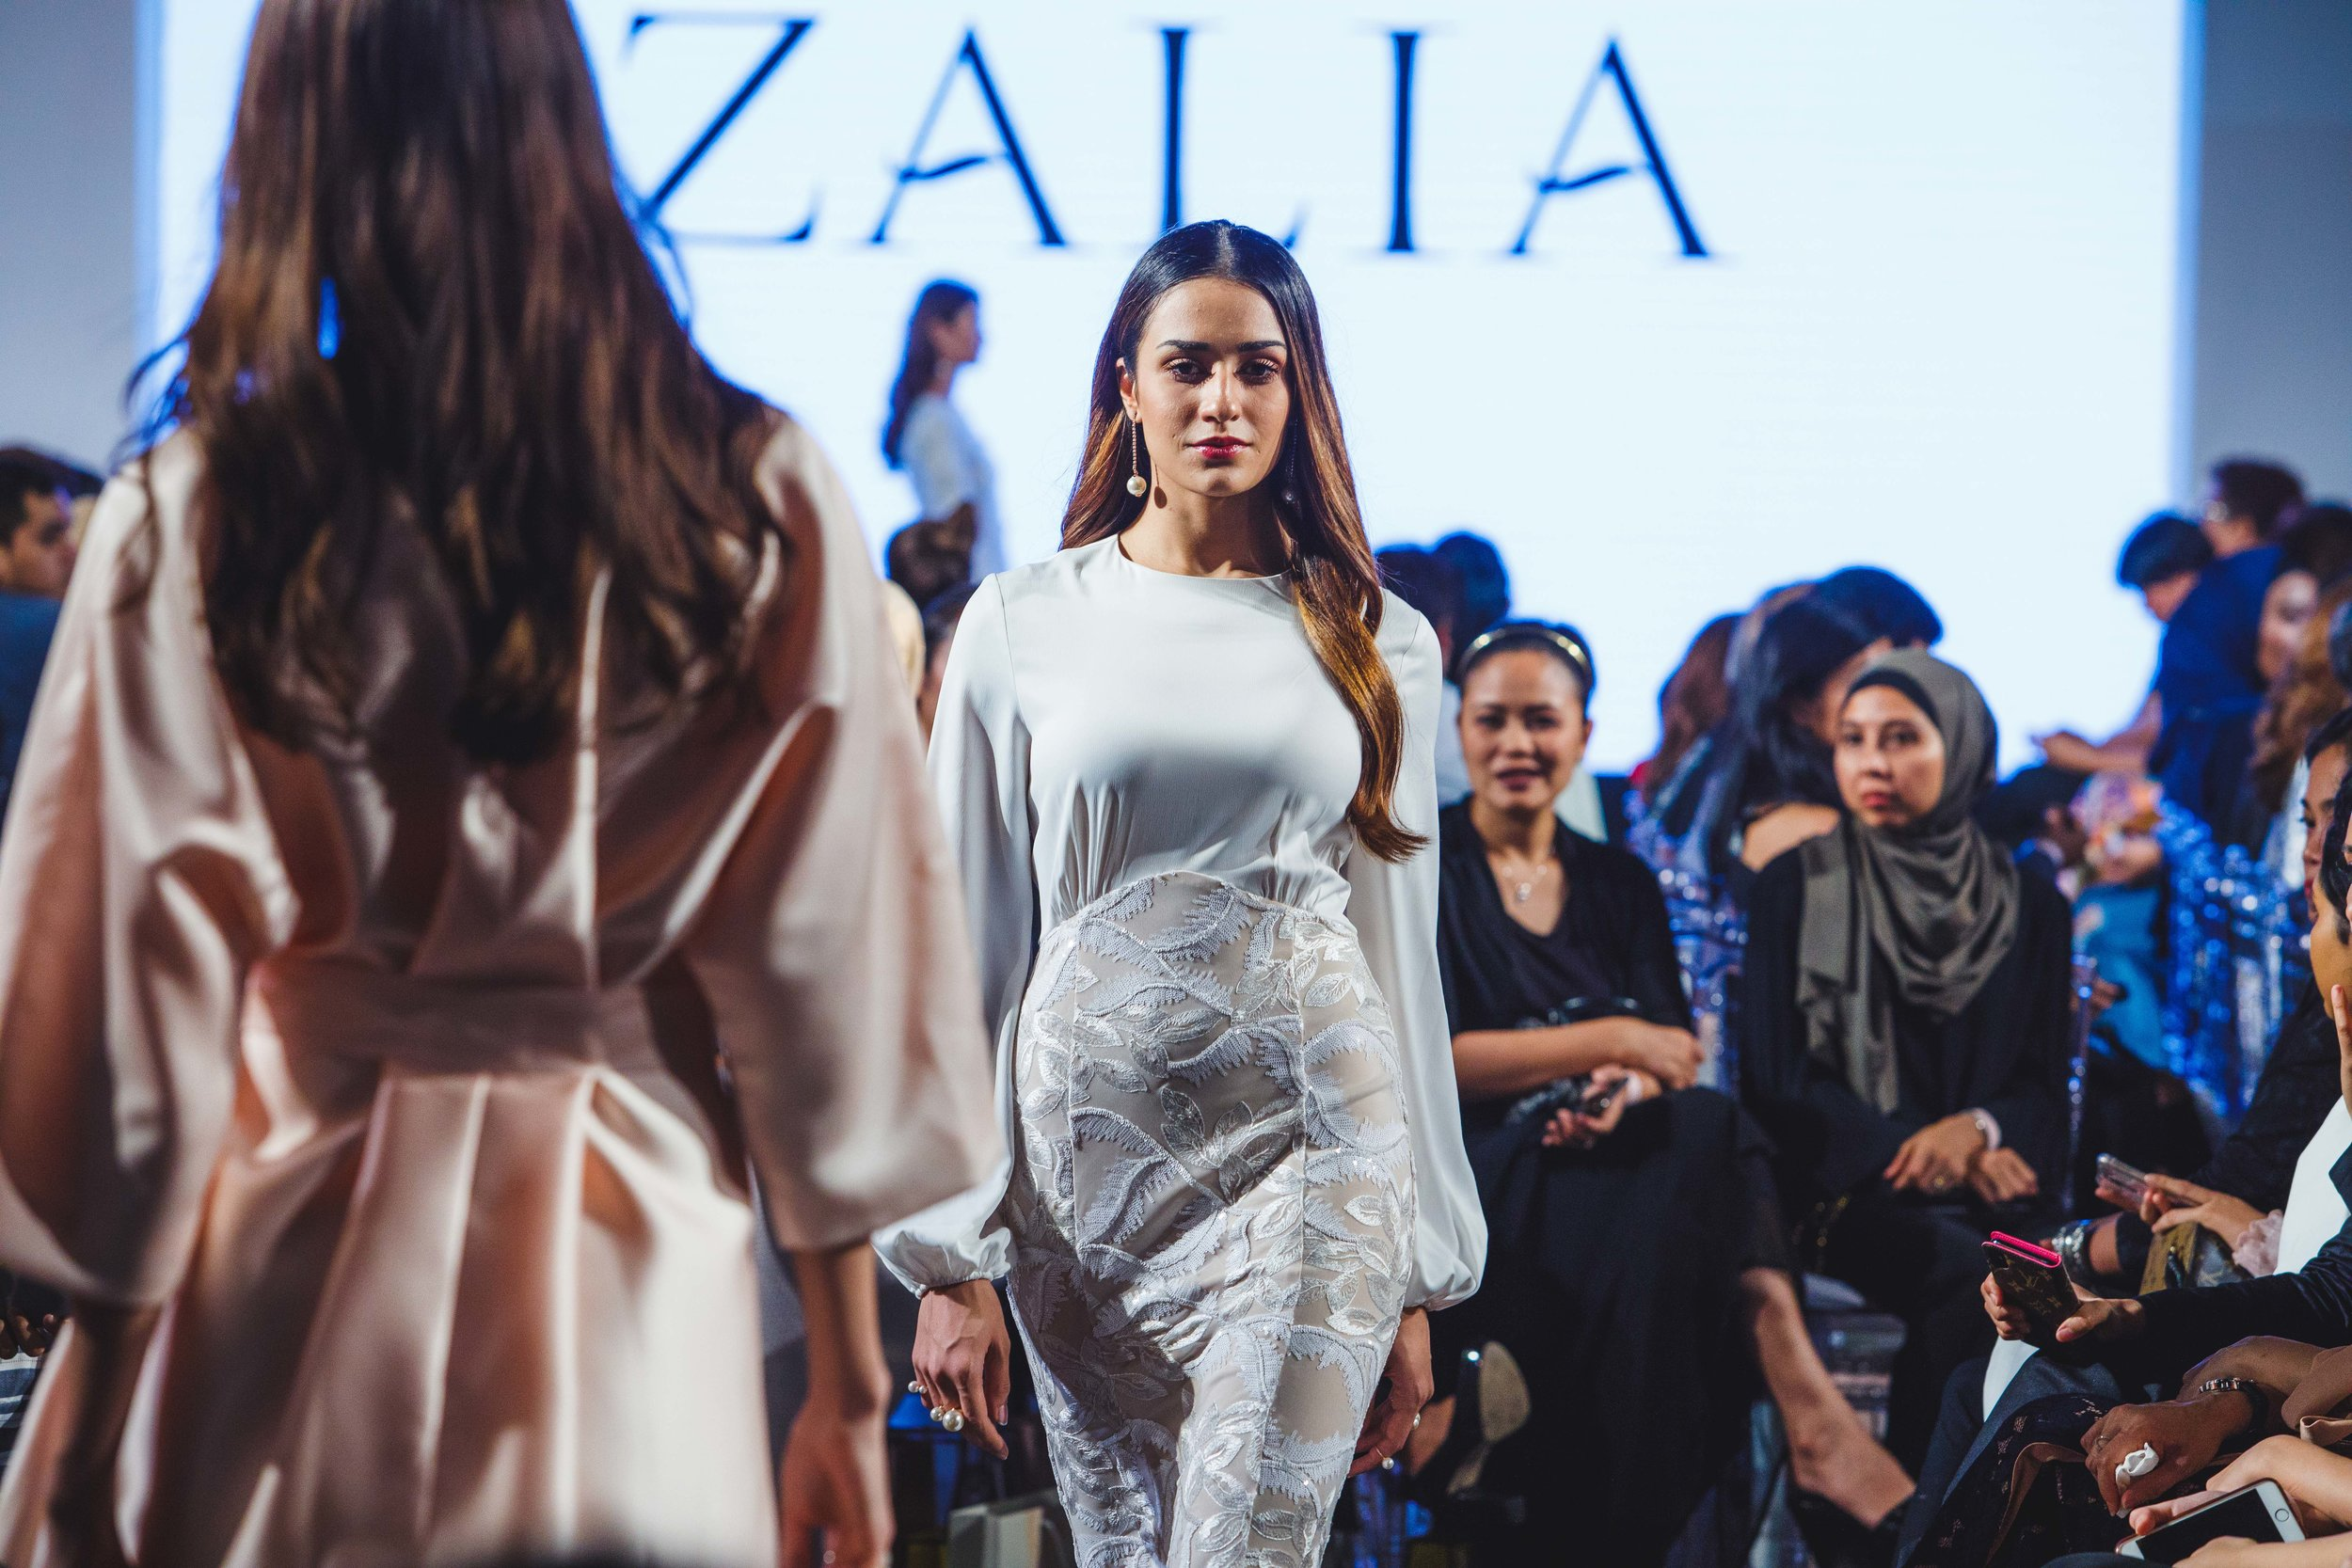 Zalora Raya 2018  - C49A6991 - Photo by Saufi Nadzri.jpg